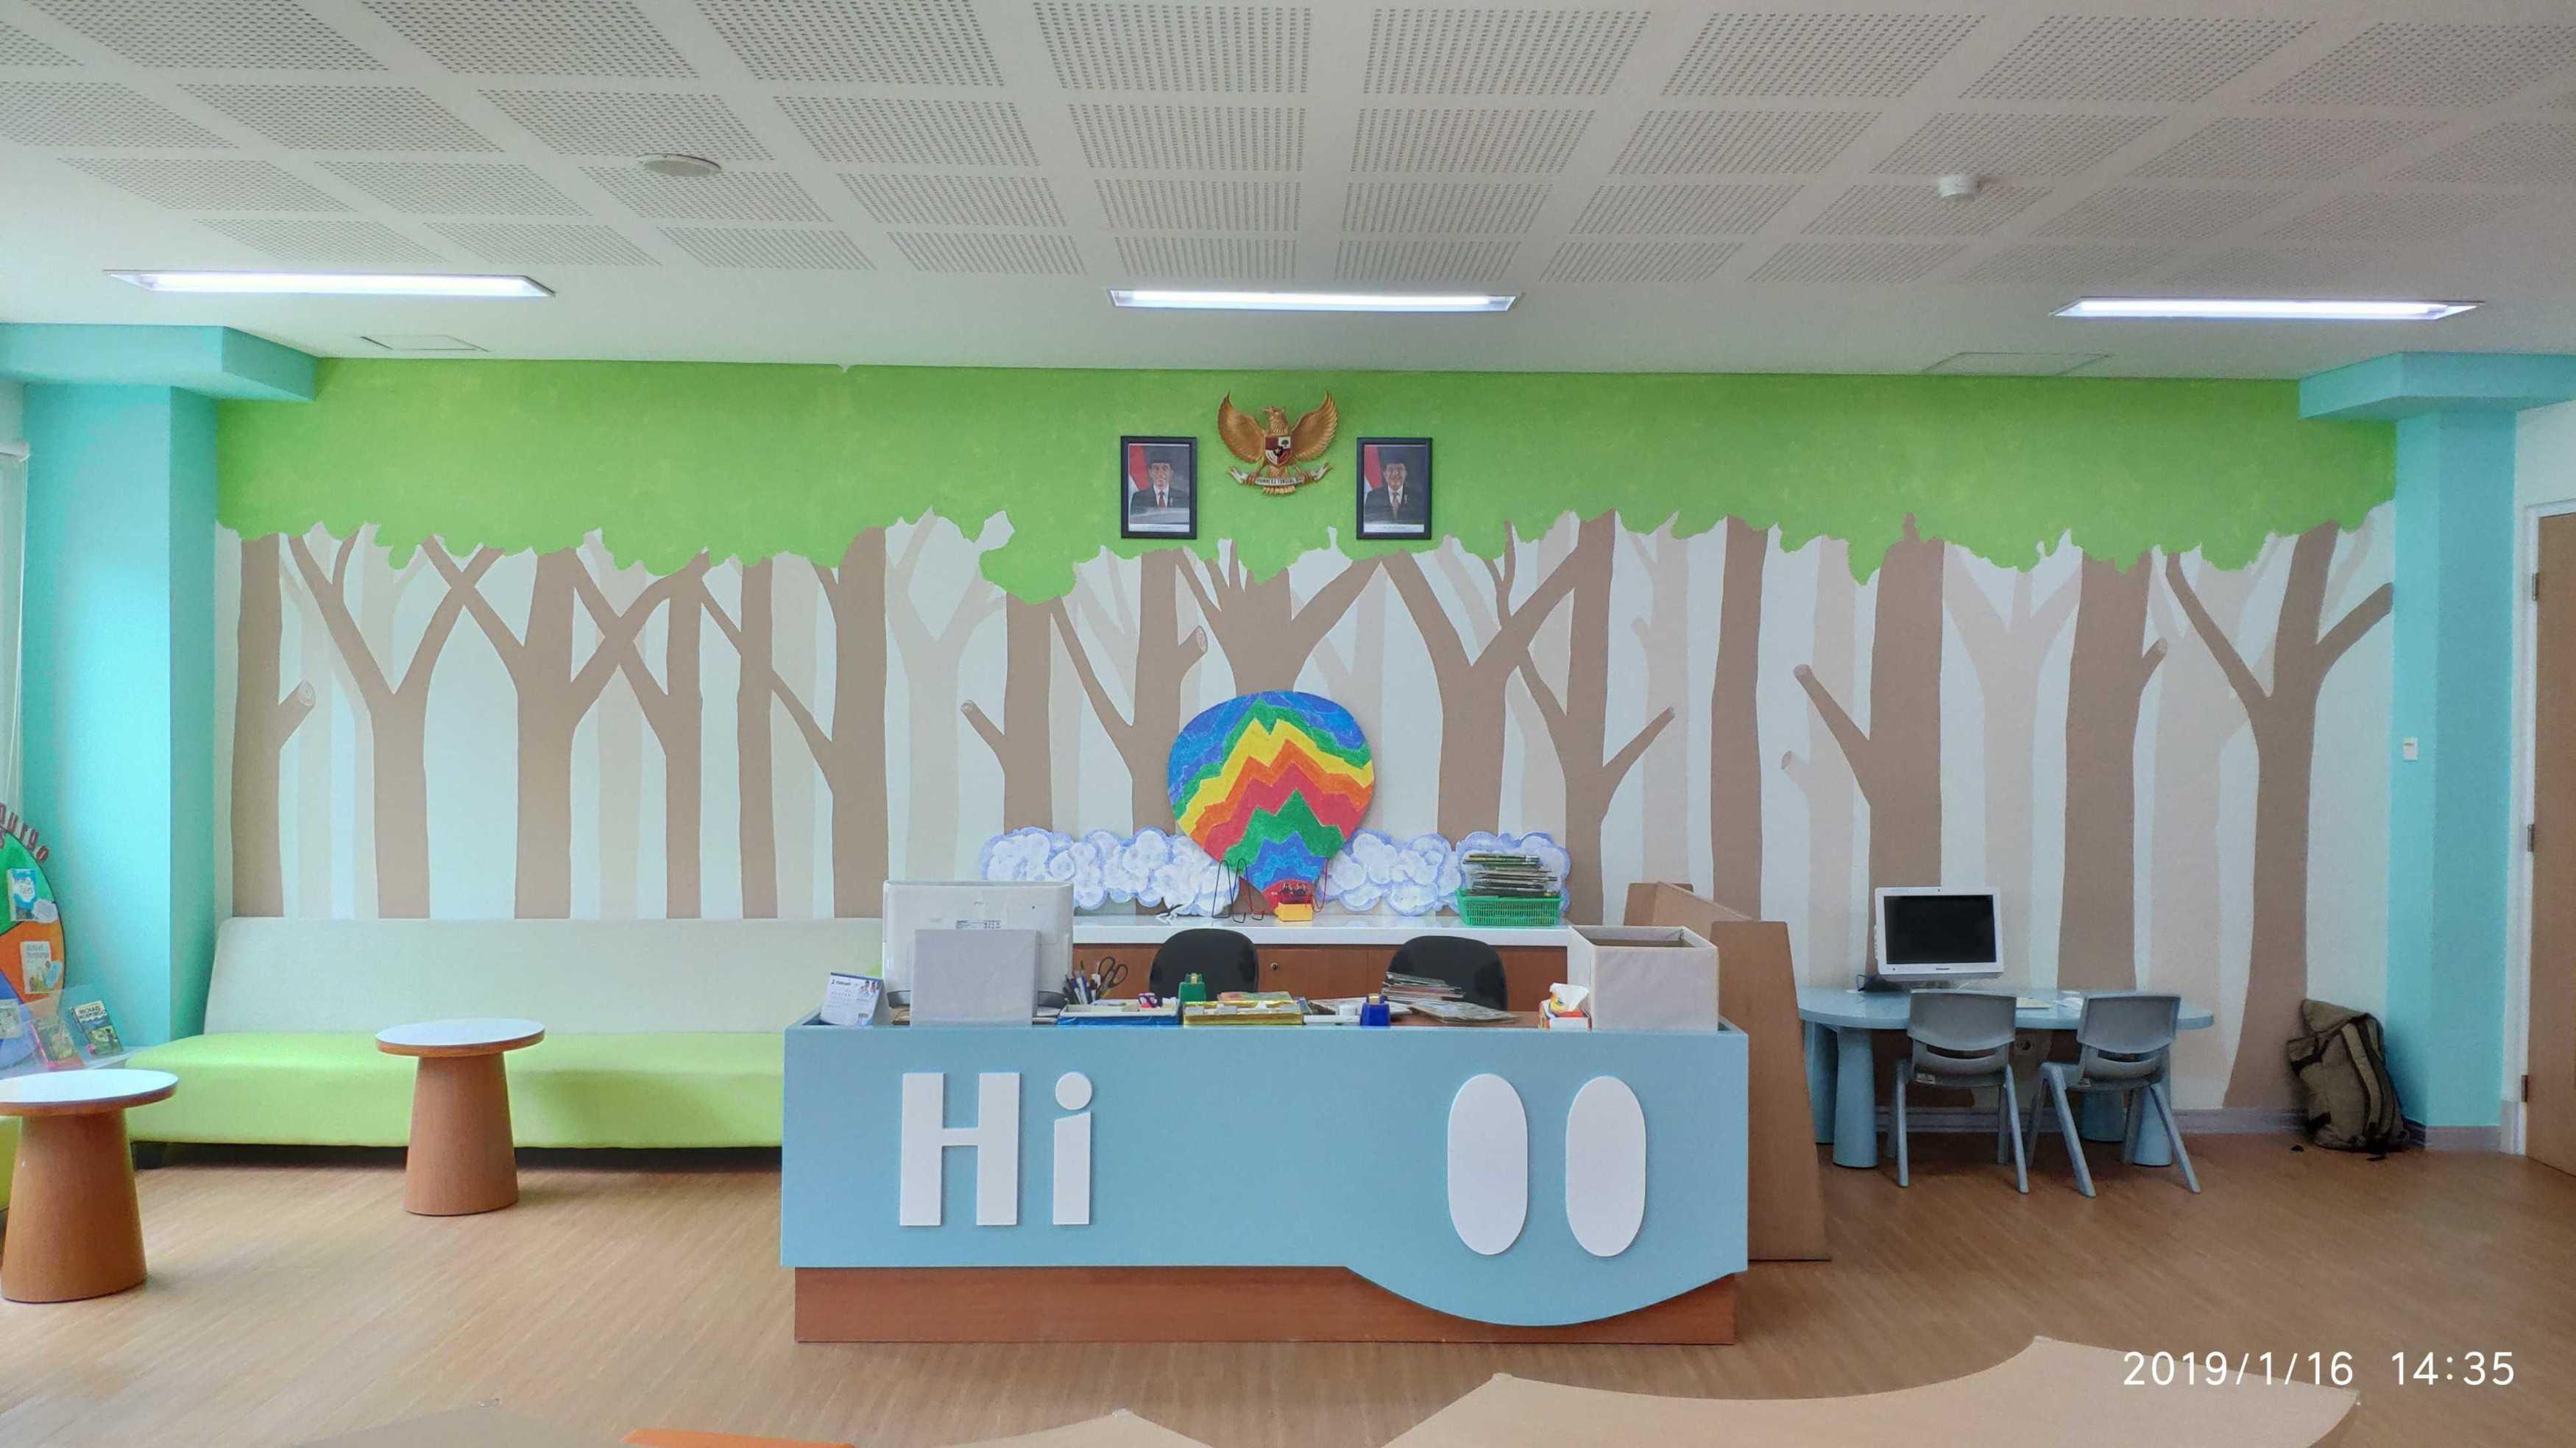 Yos Villys - Serafindo Perpustakaan Sekolah Bogor, Jawa Barat, Indonesia Bogor, Jawa Barat, Indonesia Yos-Perpustakaan-Sekolah   119788